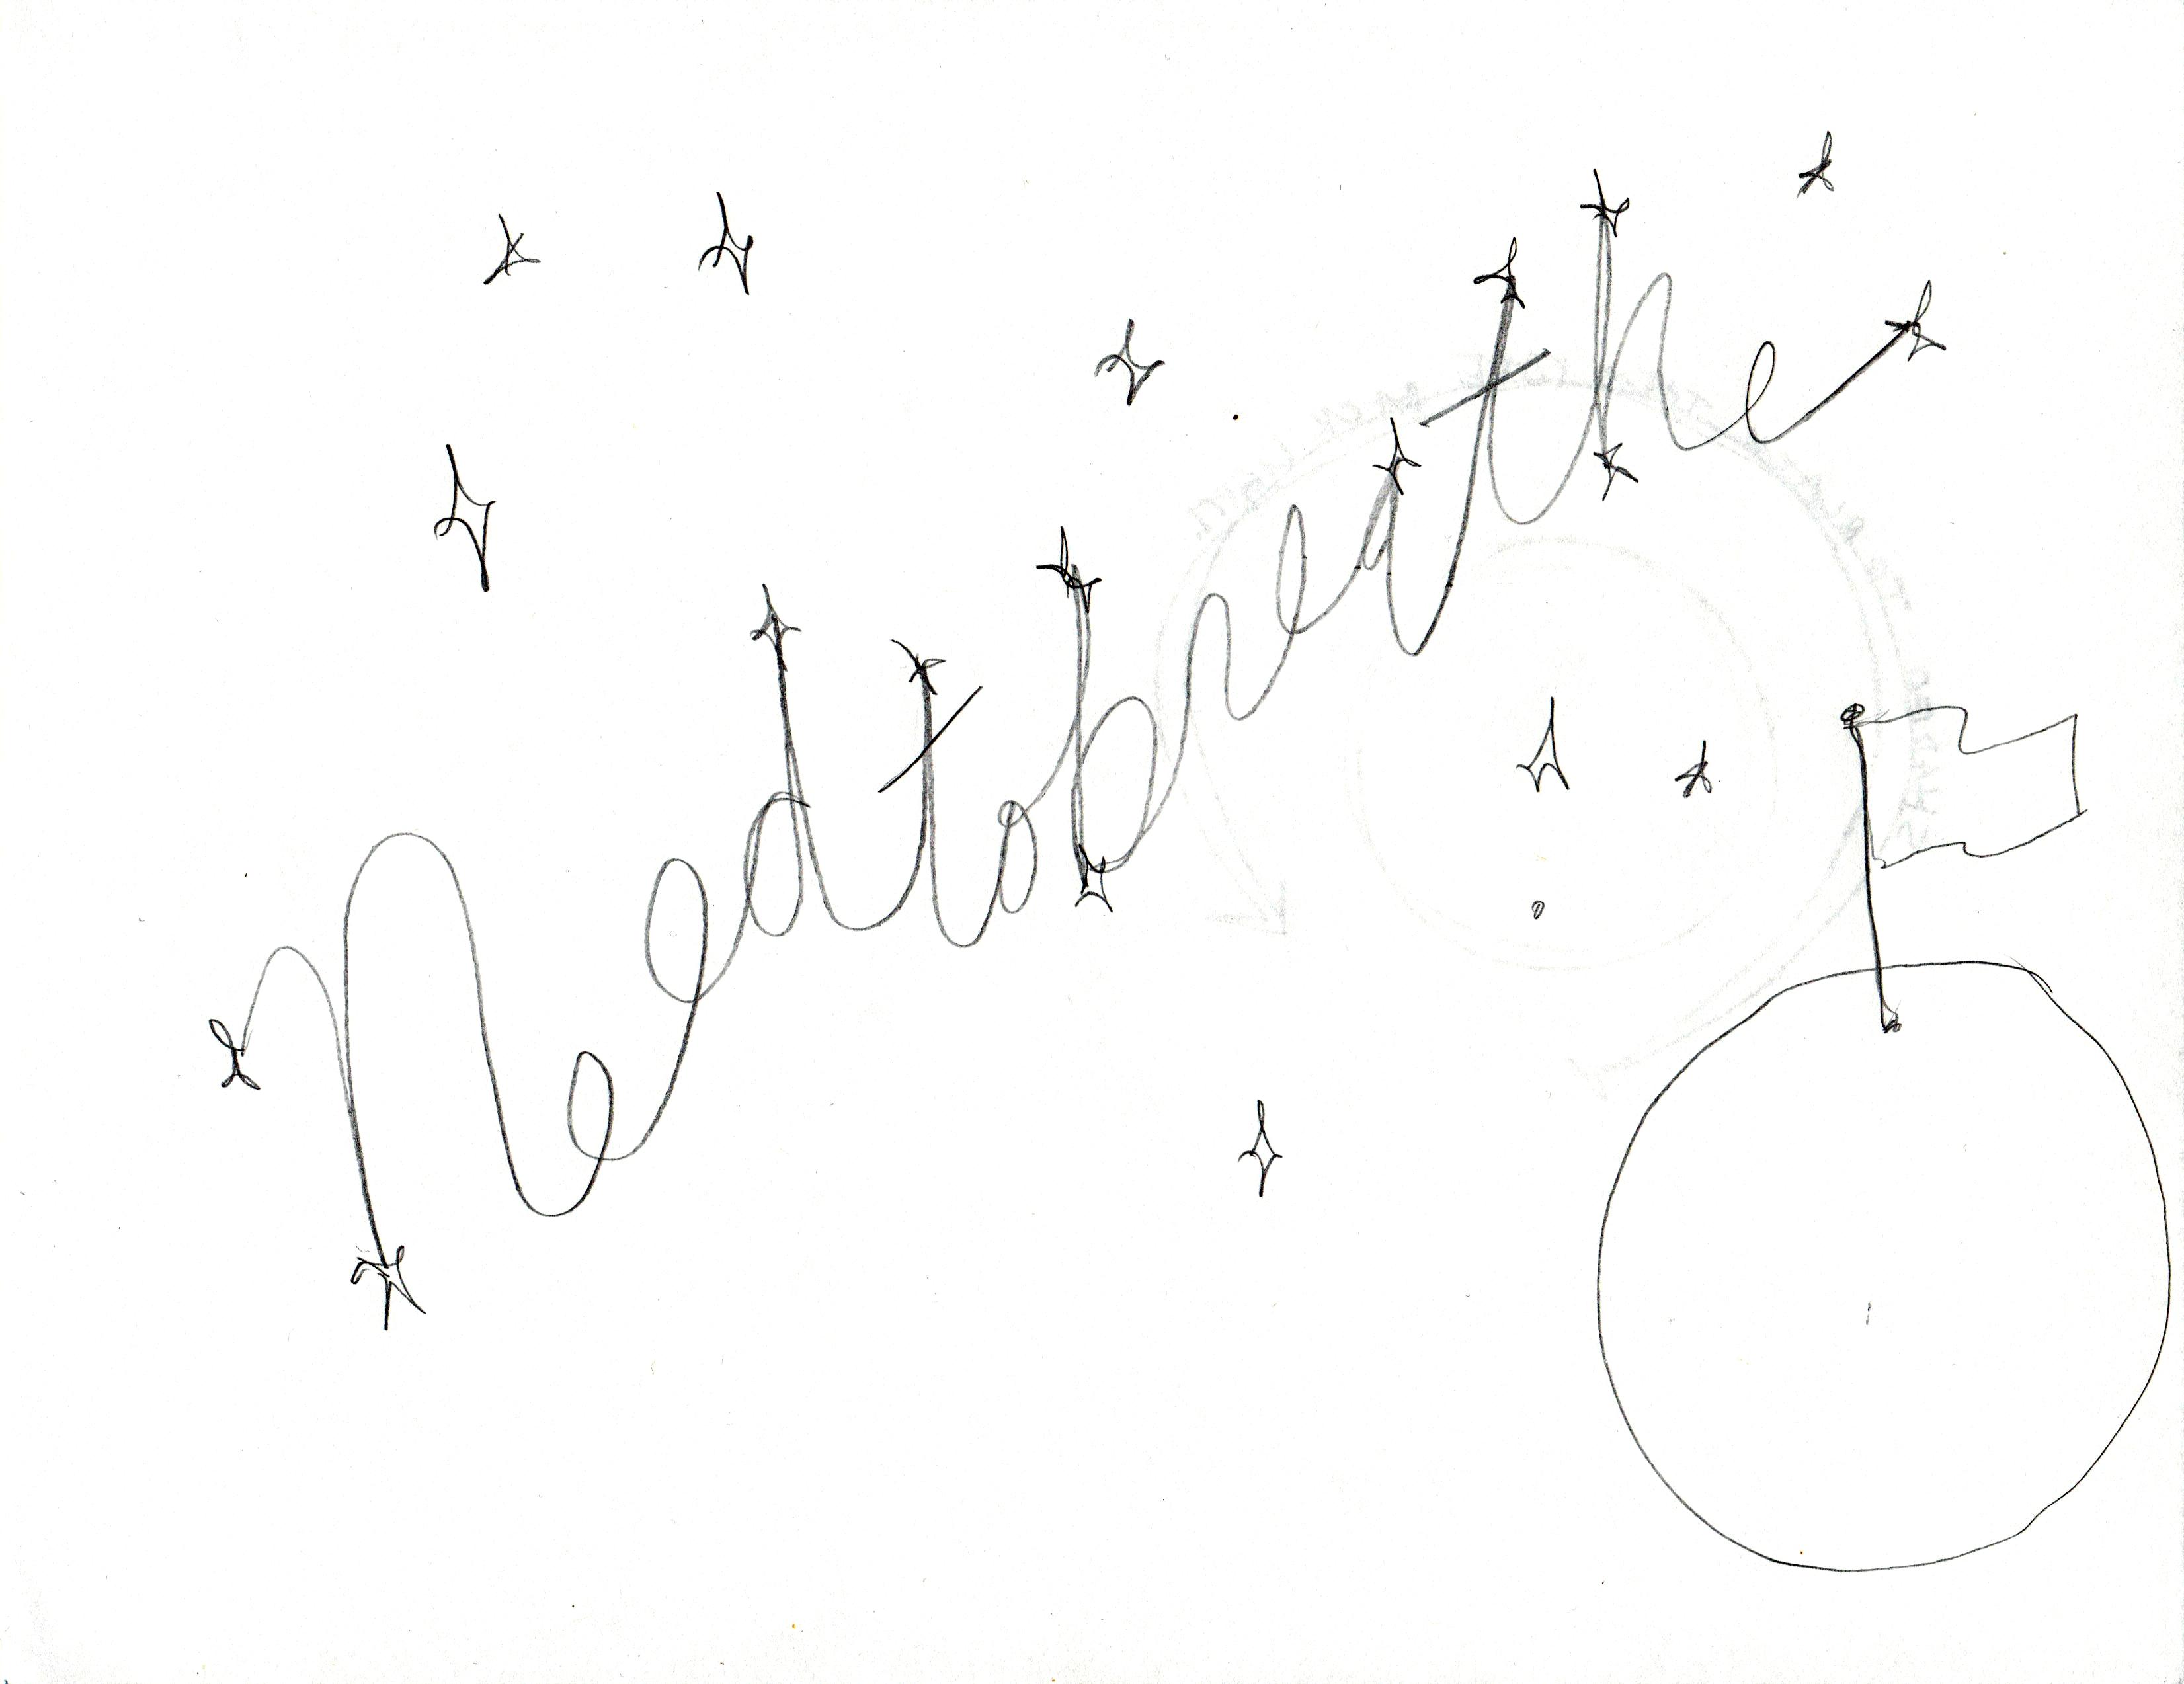 Needtobreathe - image 5 - student project